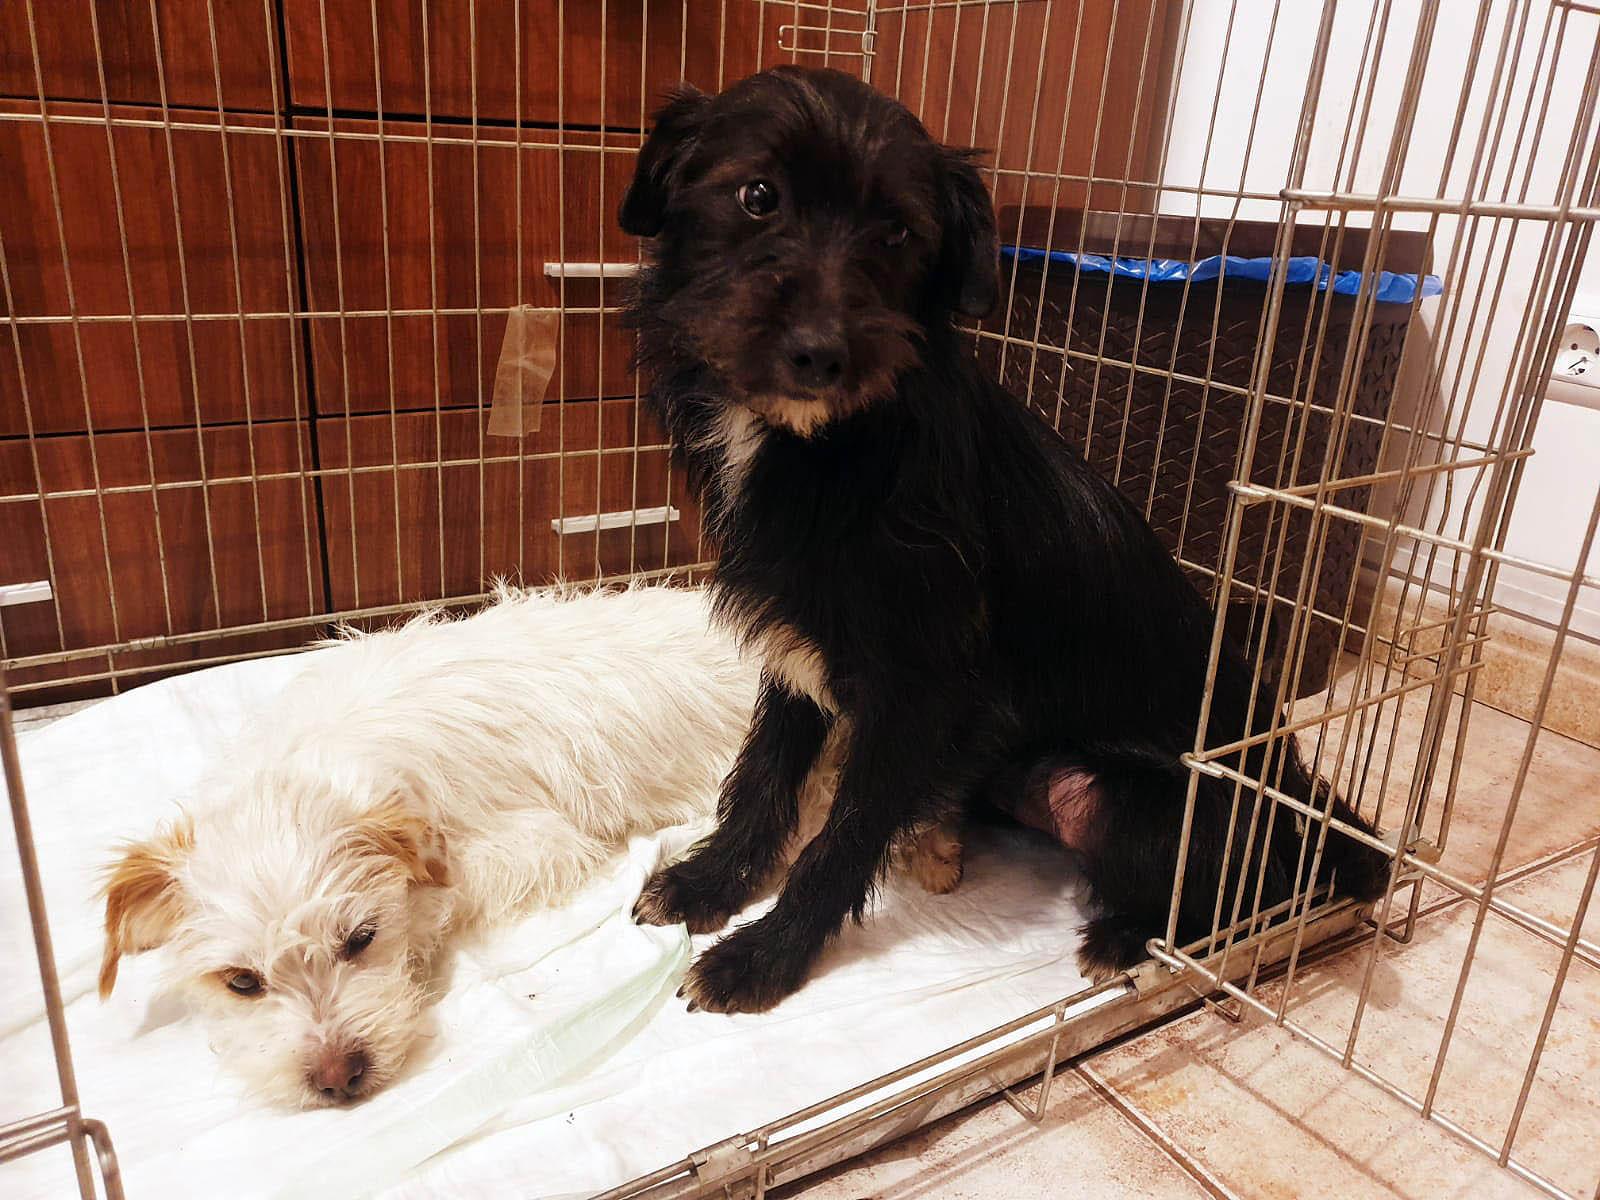 PETA HELPS ROMANIA: Hundewelpen aus dem Müll gerettet